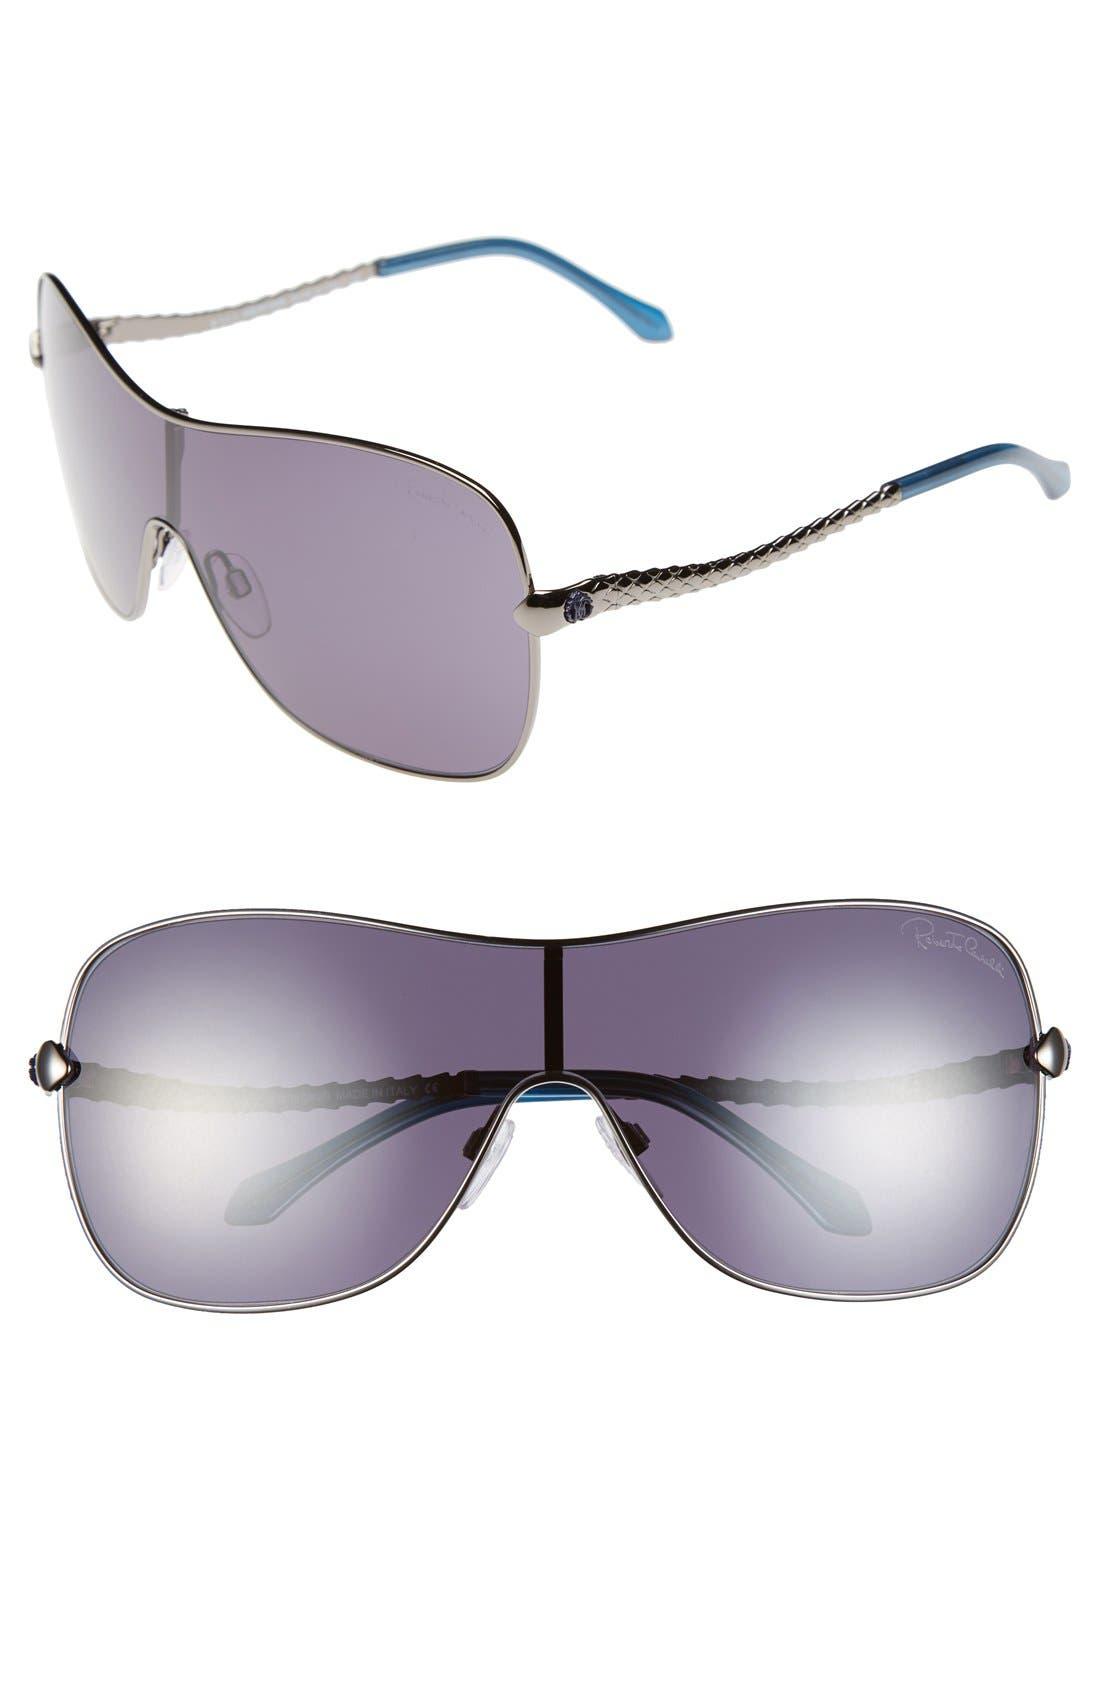 Main Image - Roberto Cavalli 'Agena' Shield Sunglasses